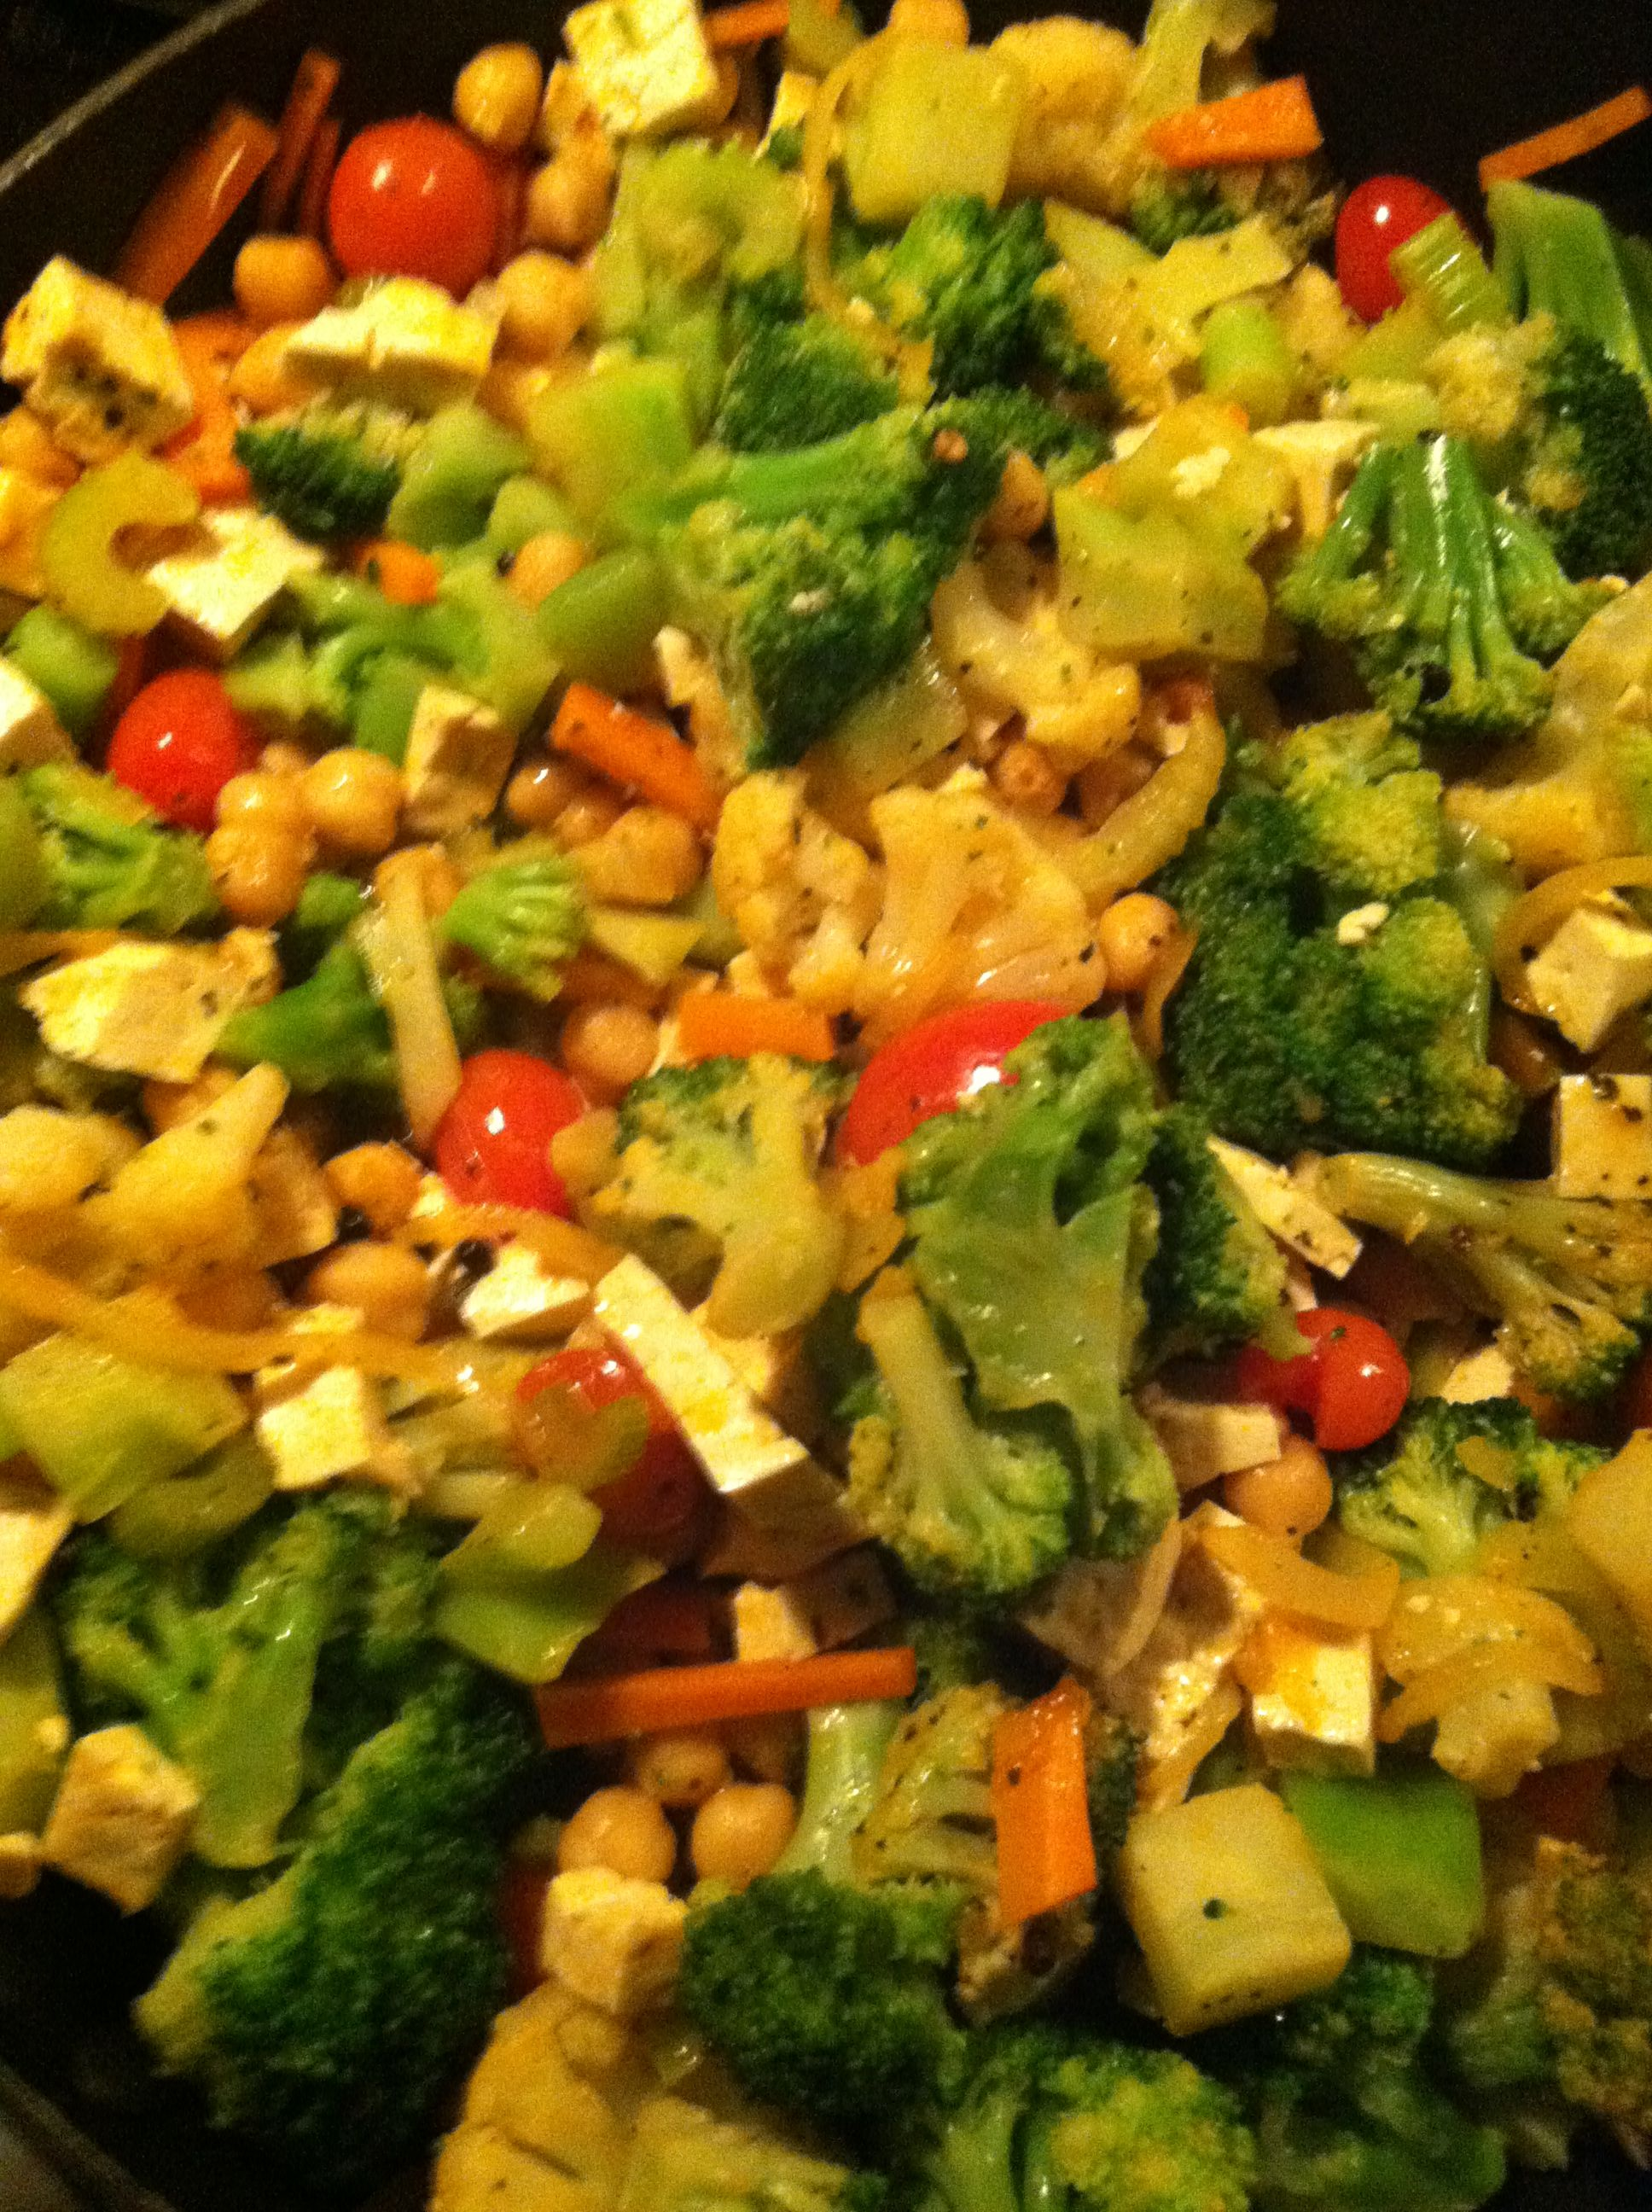 Spicy Thai tofu garbanzo stir fry | Healthy Eating | Pinterest